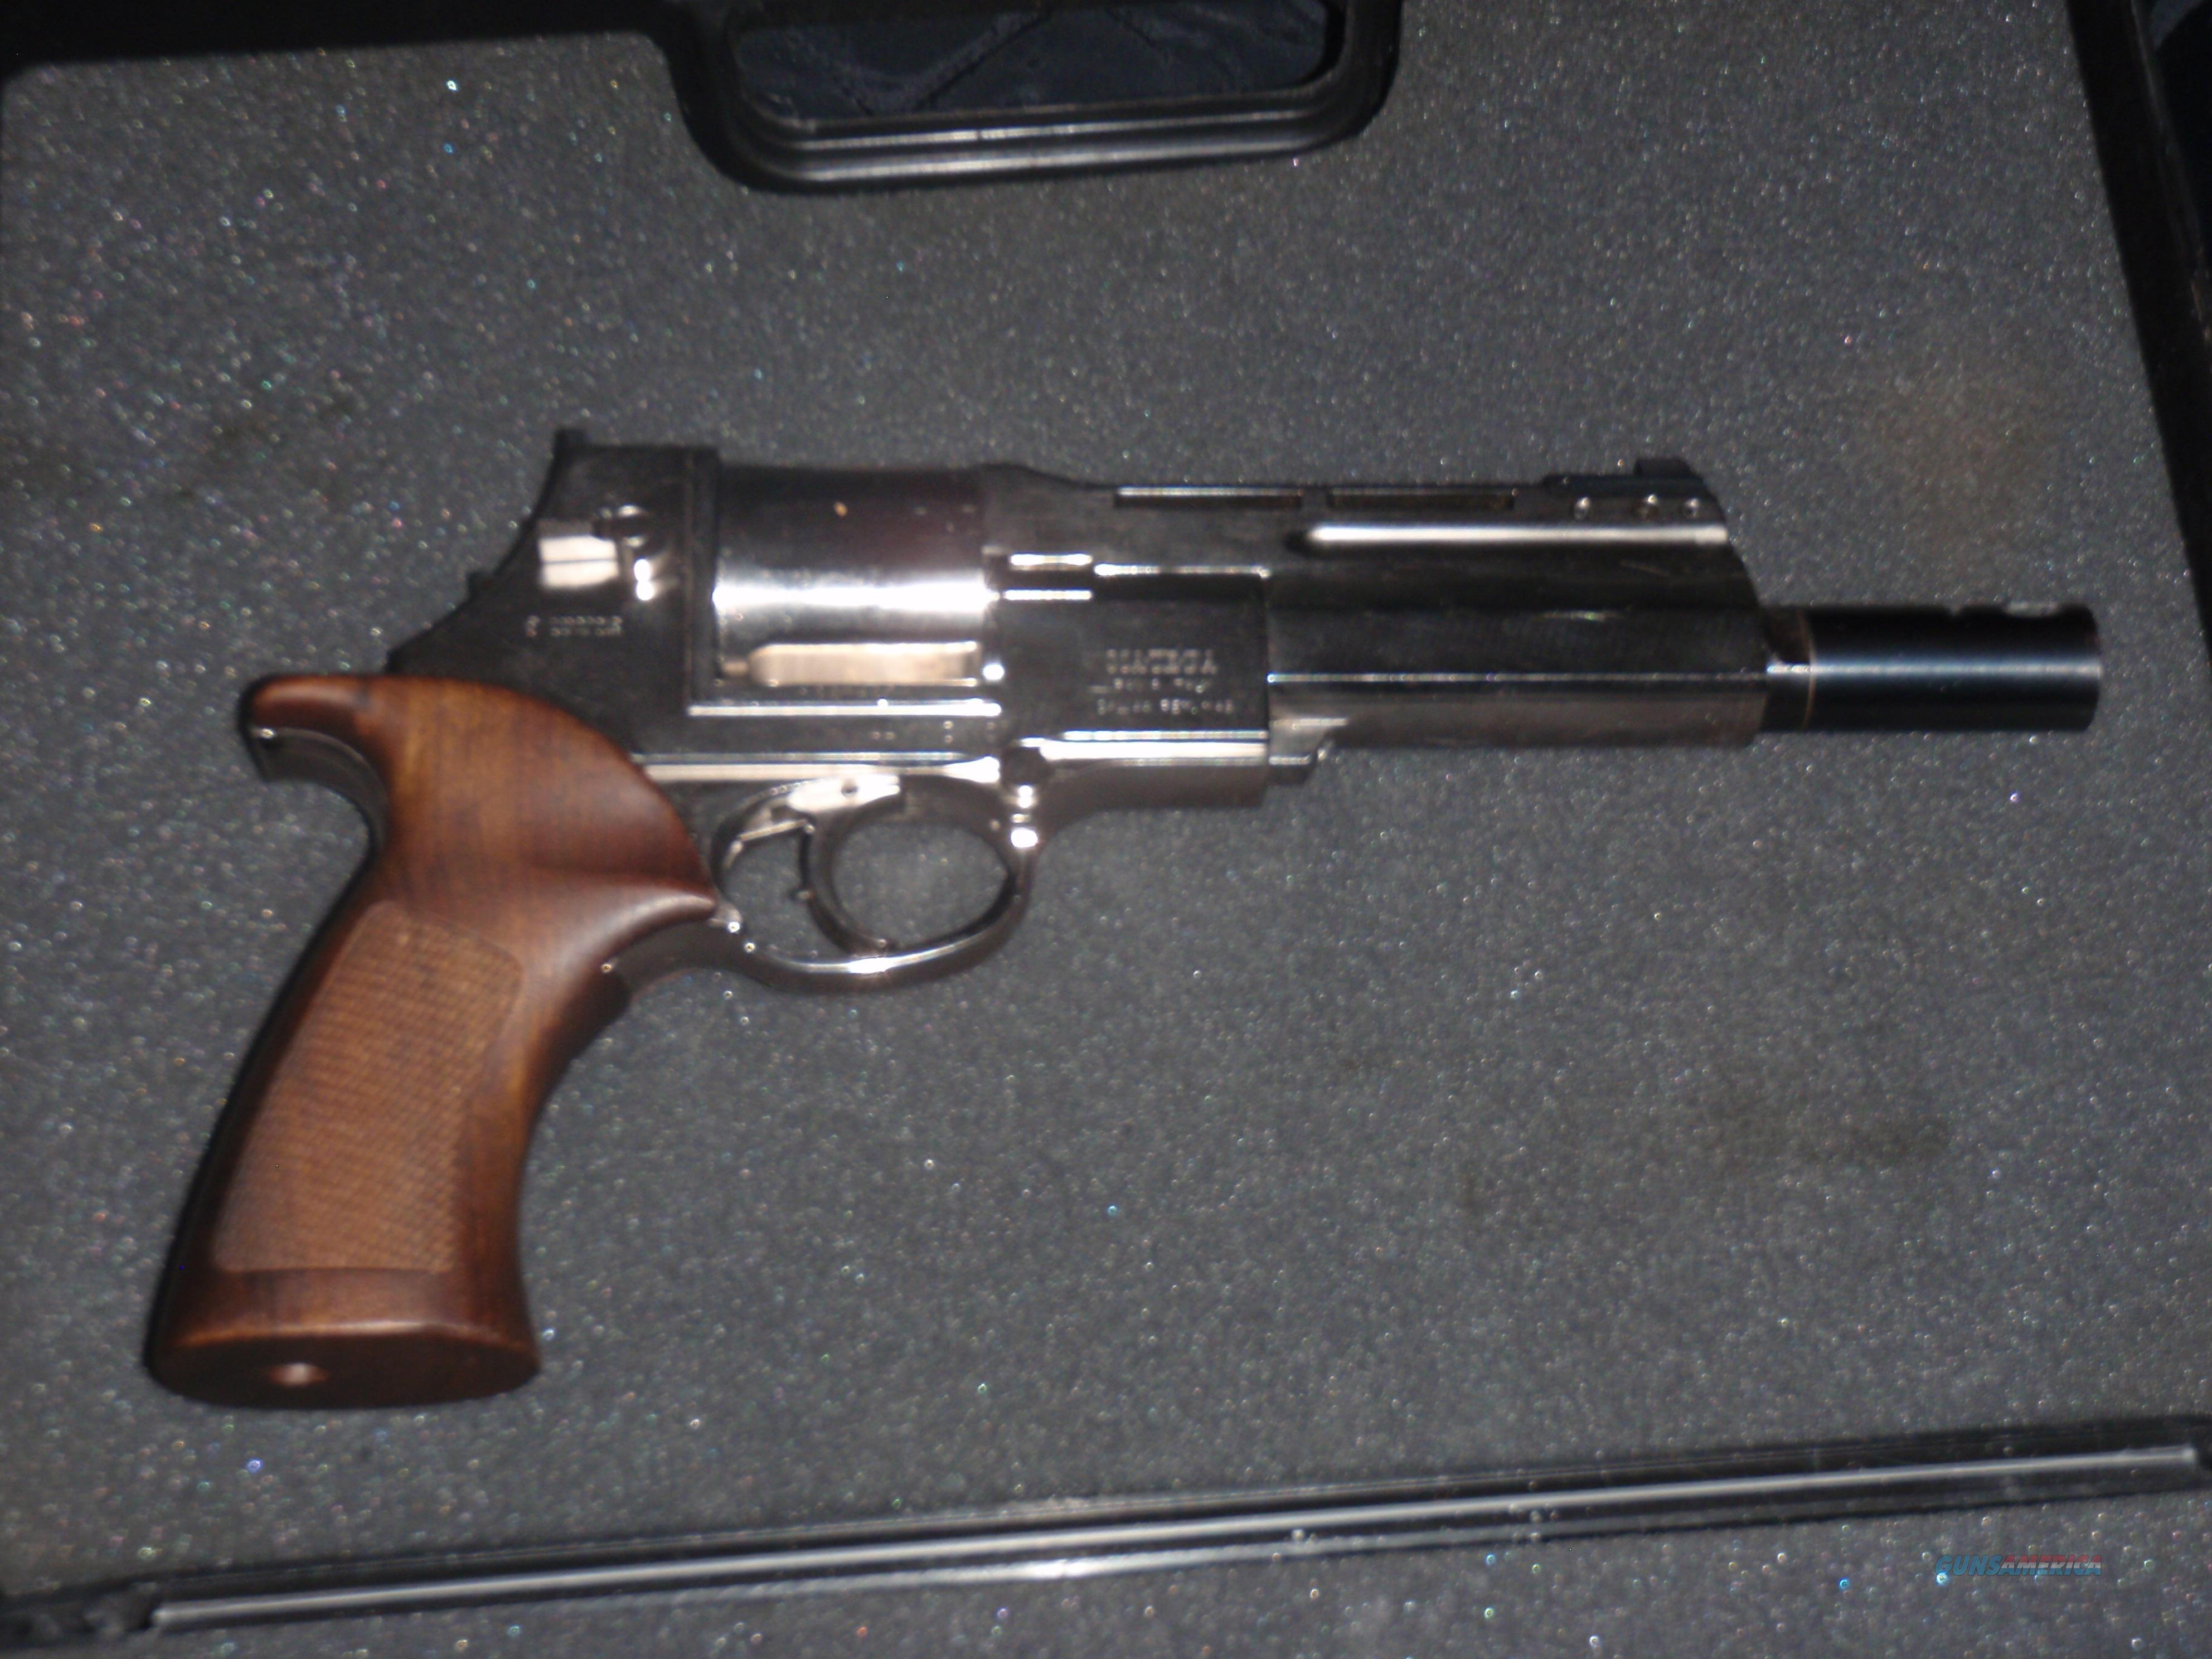 Mateba Unica Revolver Backgrounds on Wallpapers Vista